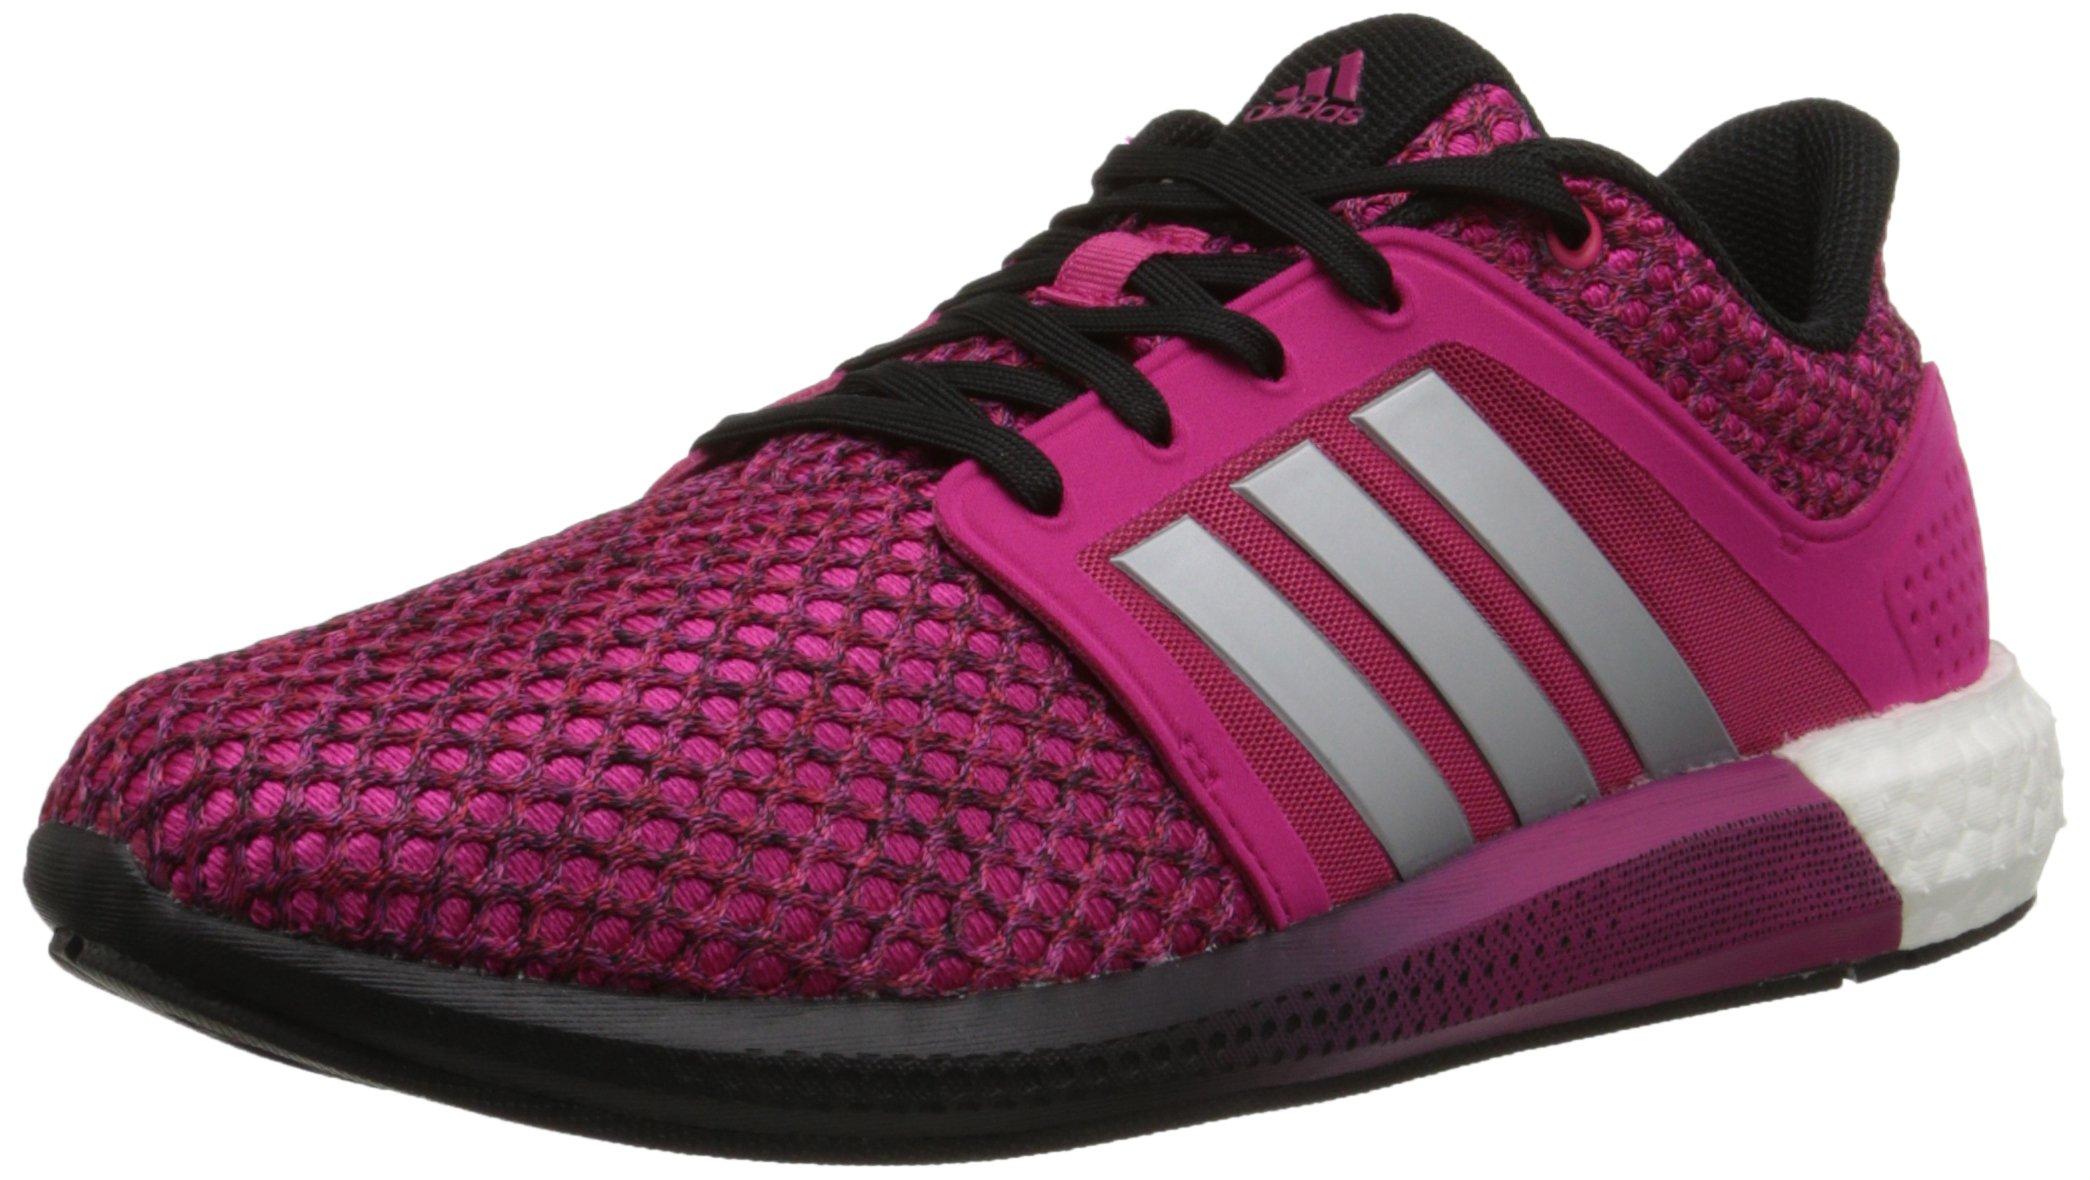 new product 56069 50268 Galleon - Adidas Performance Womens Solar Boost Running Shoe,  PinkSilverWhite, 9 M US